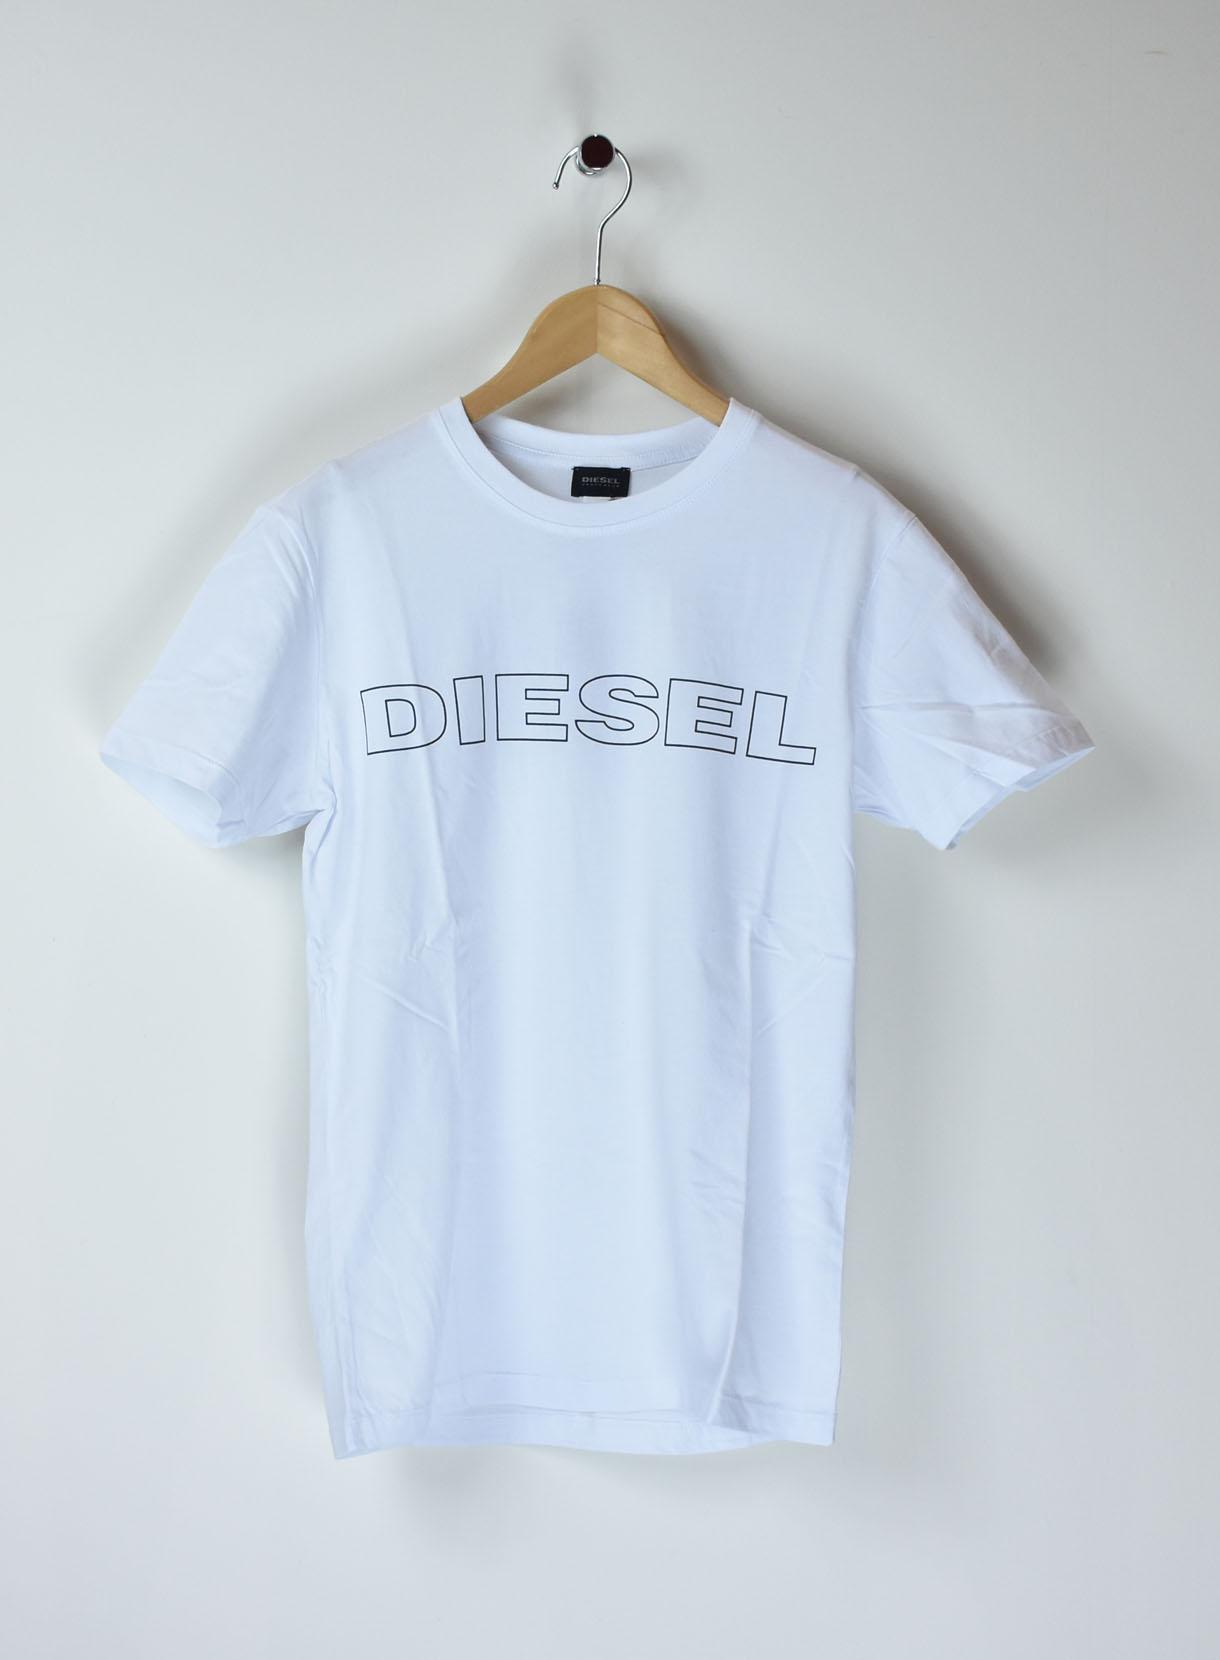 DIESEL フロントロゴTシャツ(WEB限定・数量限定)